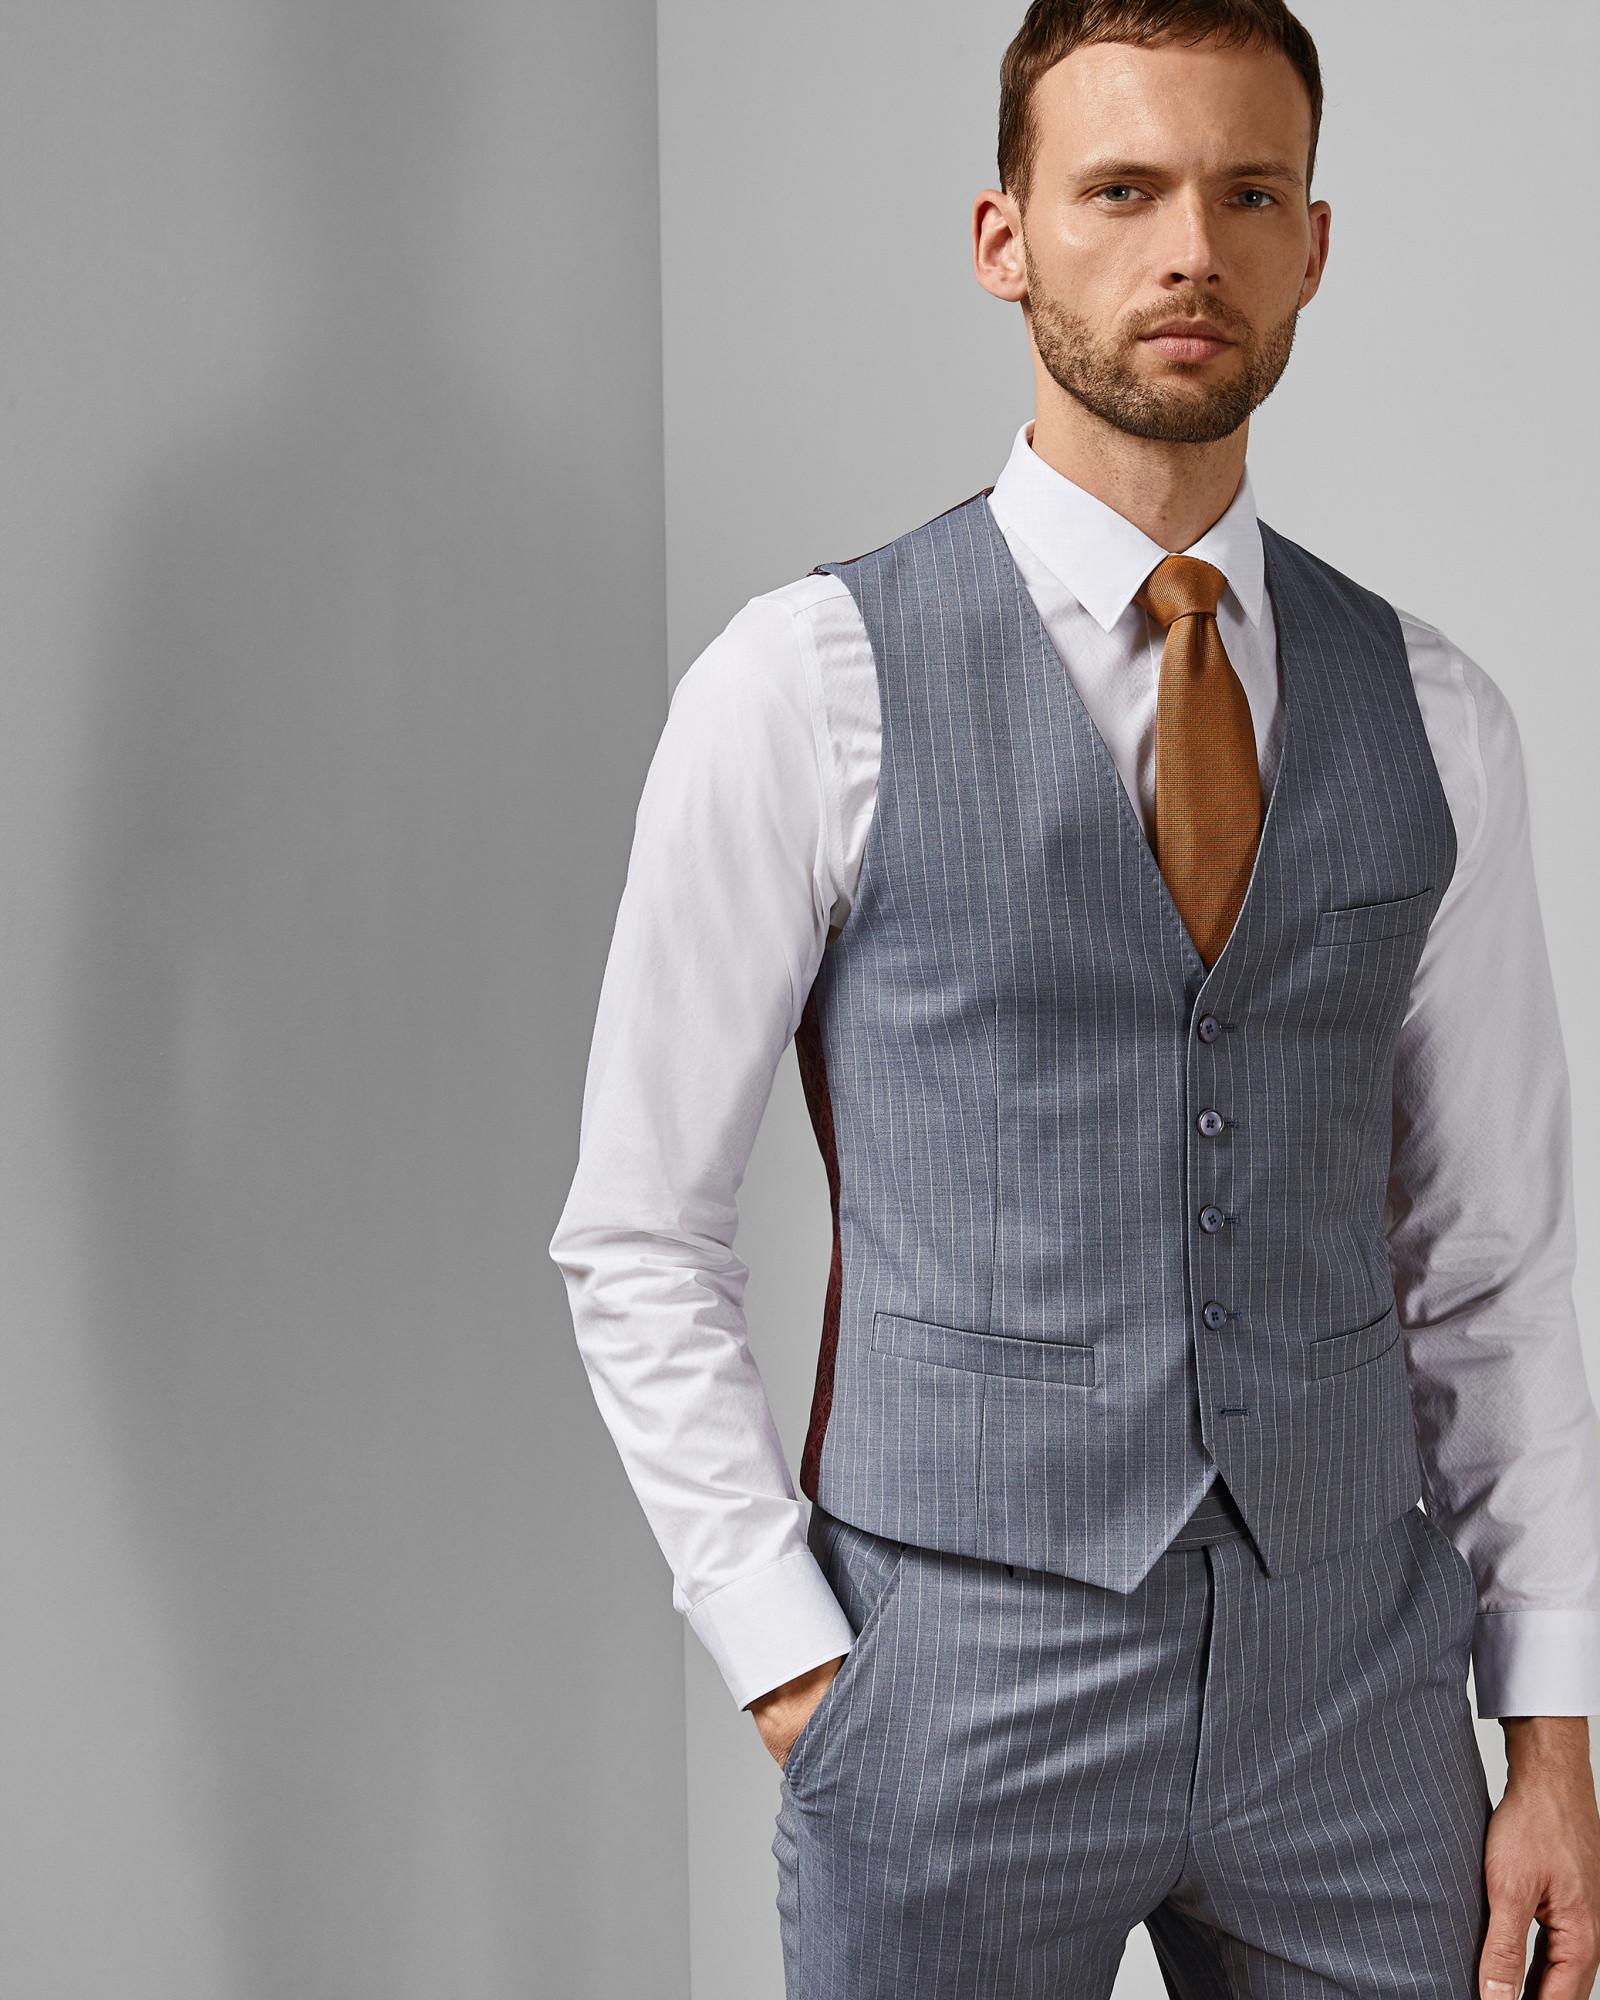 29ddbcfb9 Ted Baker Debonair Stripe Wool Waistcoat in Blue for Men - Lyst